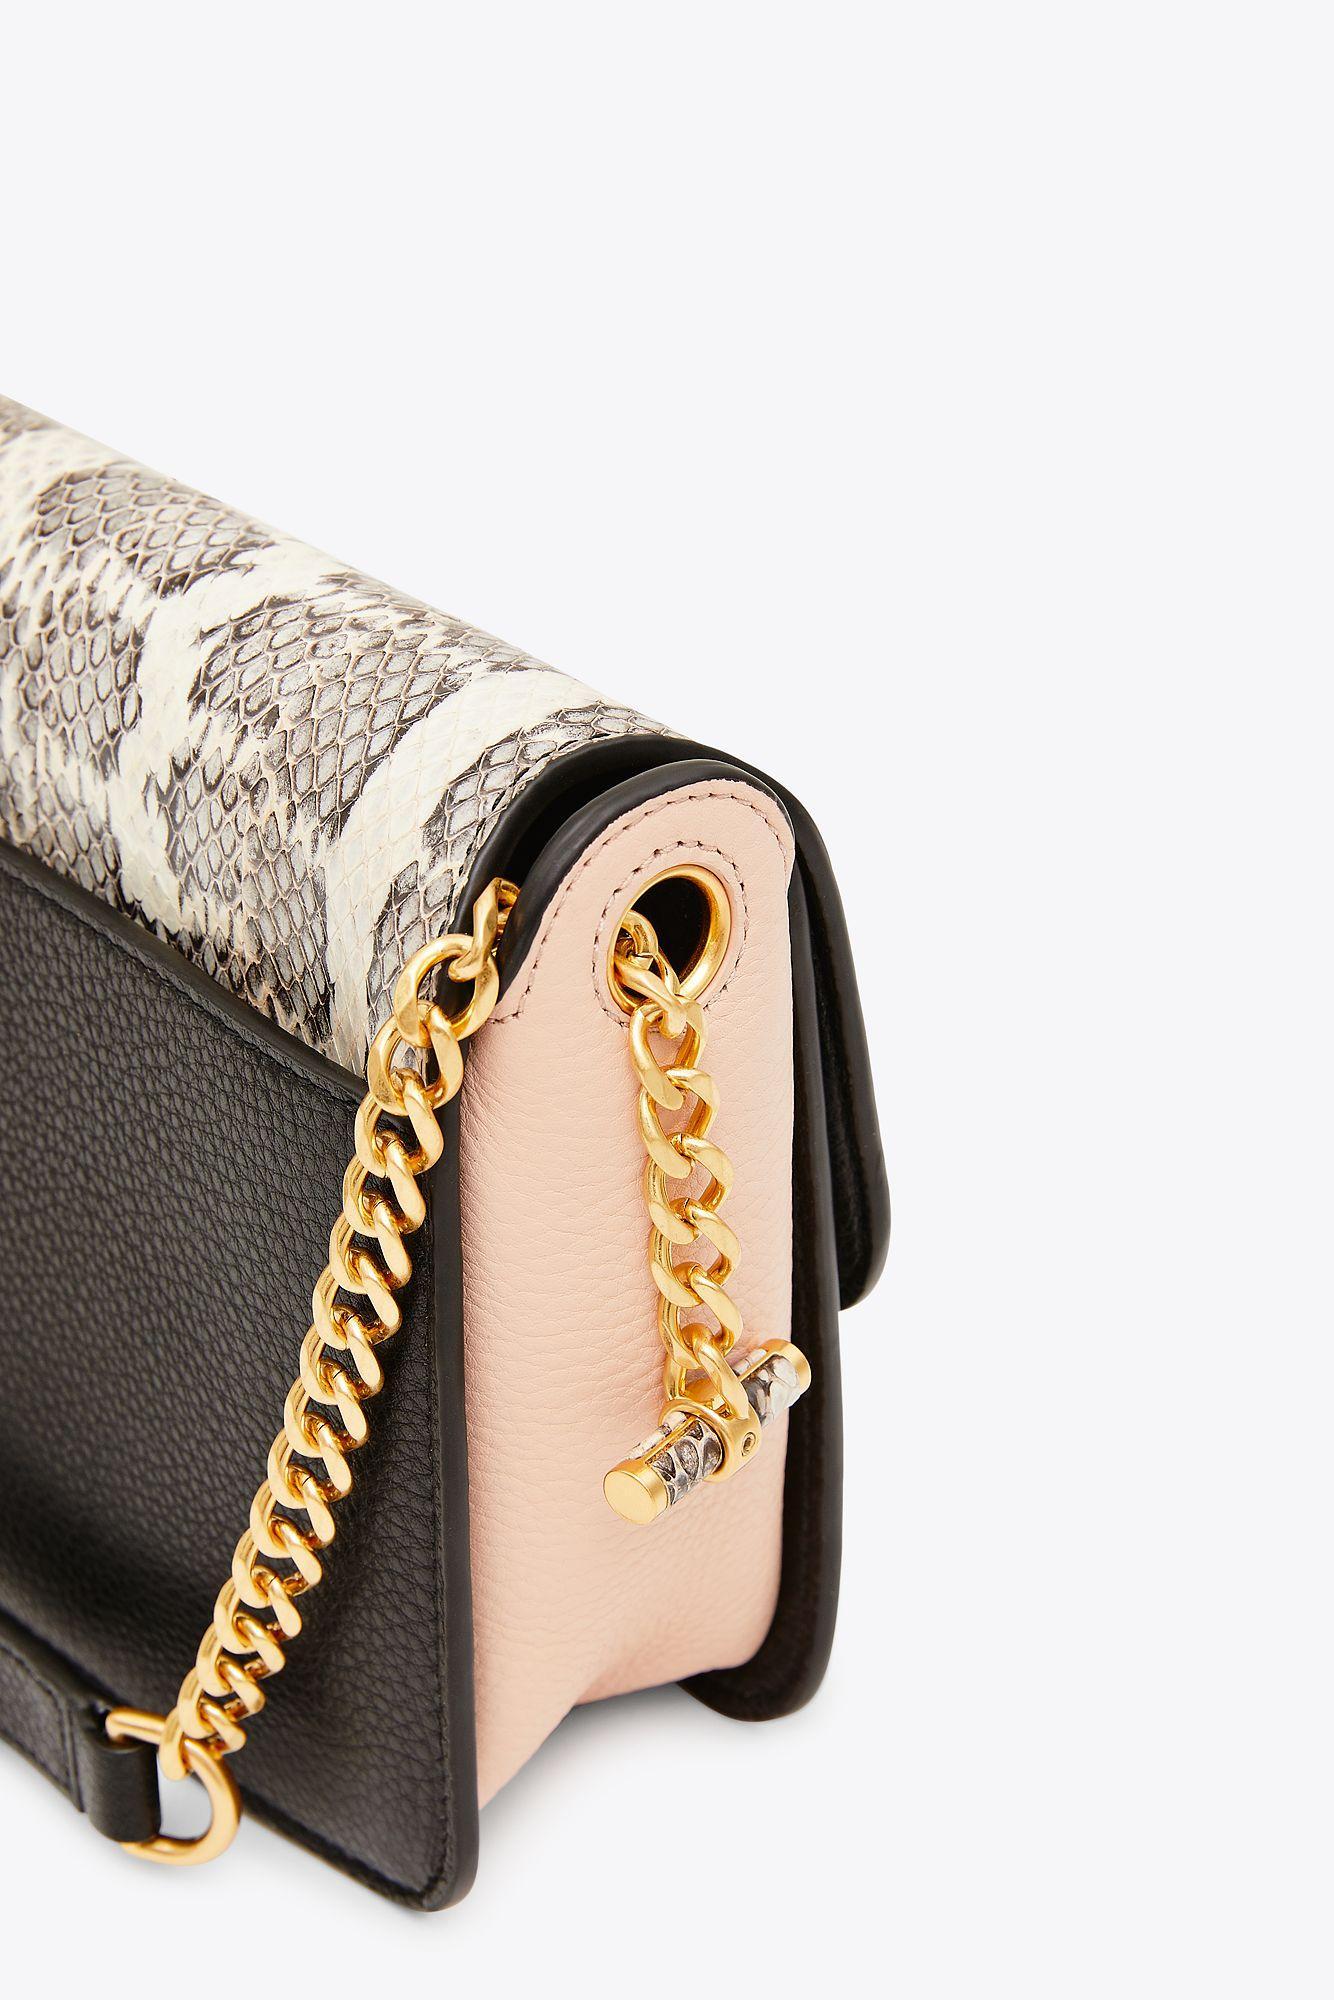 61043ad01b Tory Burch Chelsea Colorblock Snake Crossbody   019   Crossbody Bags ...